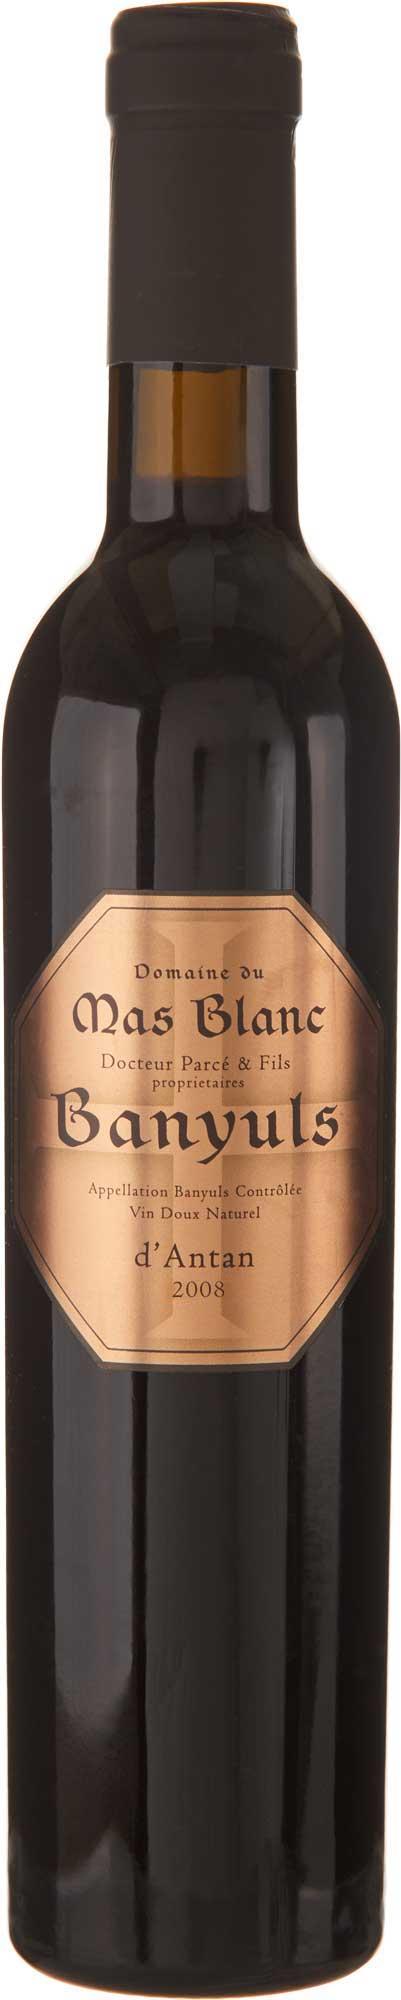 "Domaine du Mas Blanc Banyuls ""d'Antan"" 2008"